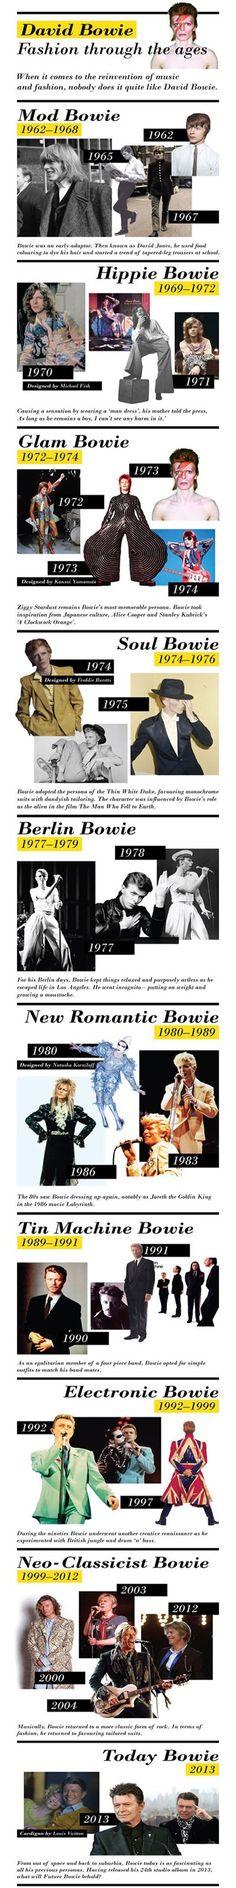 David Bowie: Fashion Through the Ages